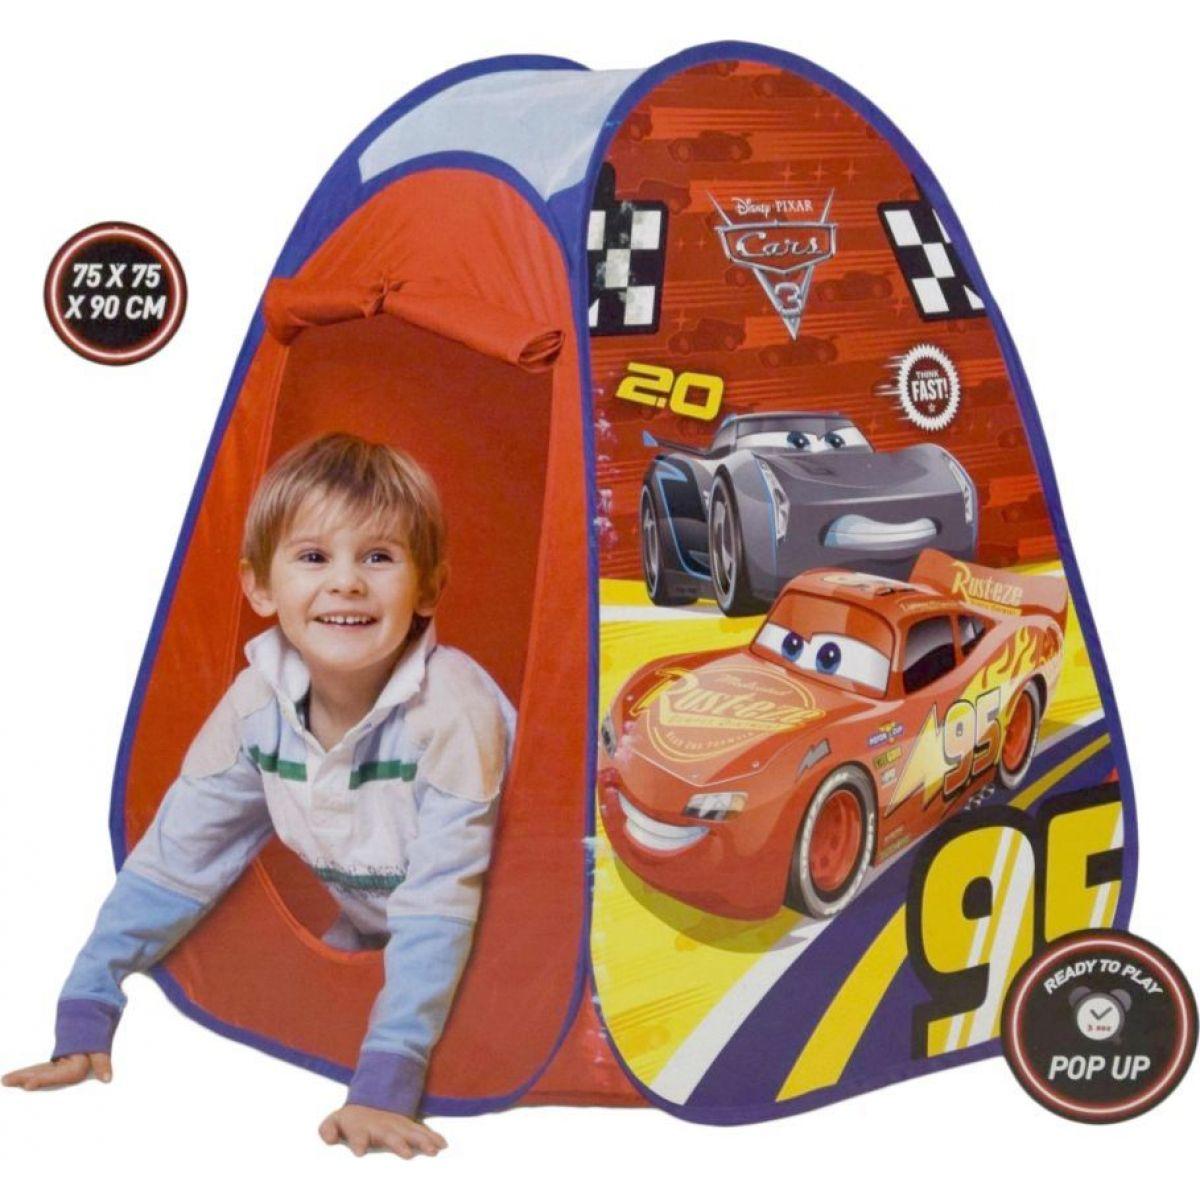 John POP UP stan Cars 75 x 75 x 90cm